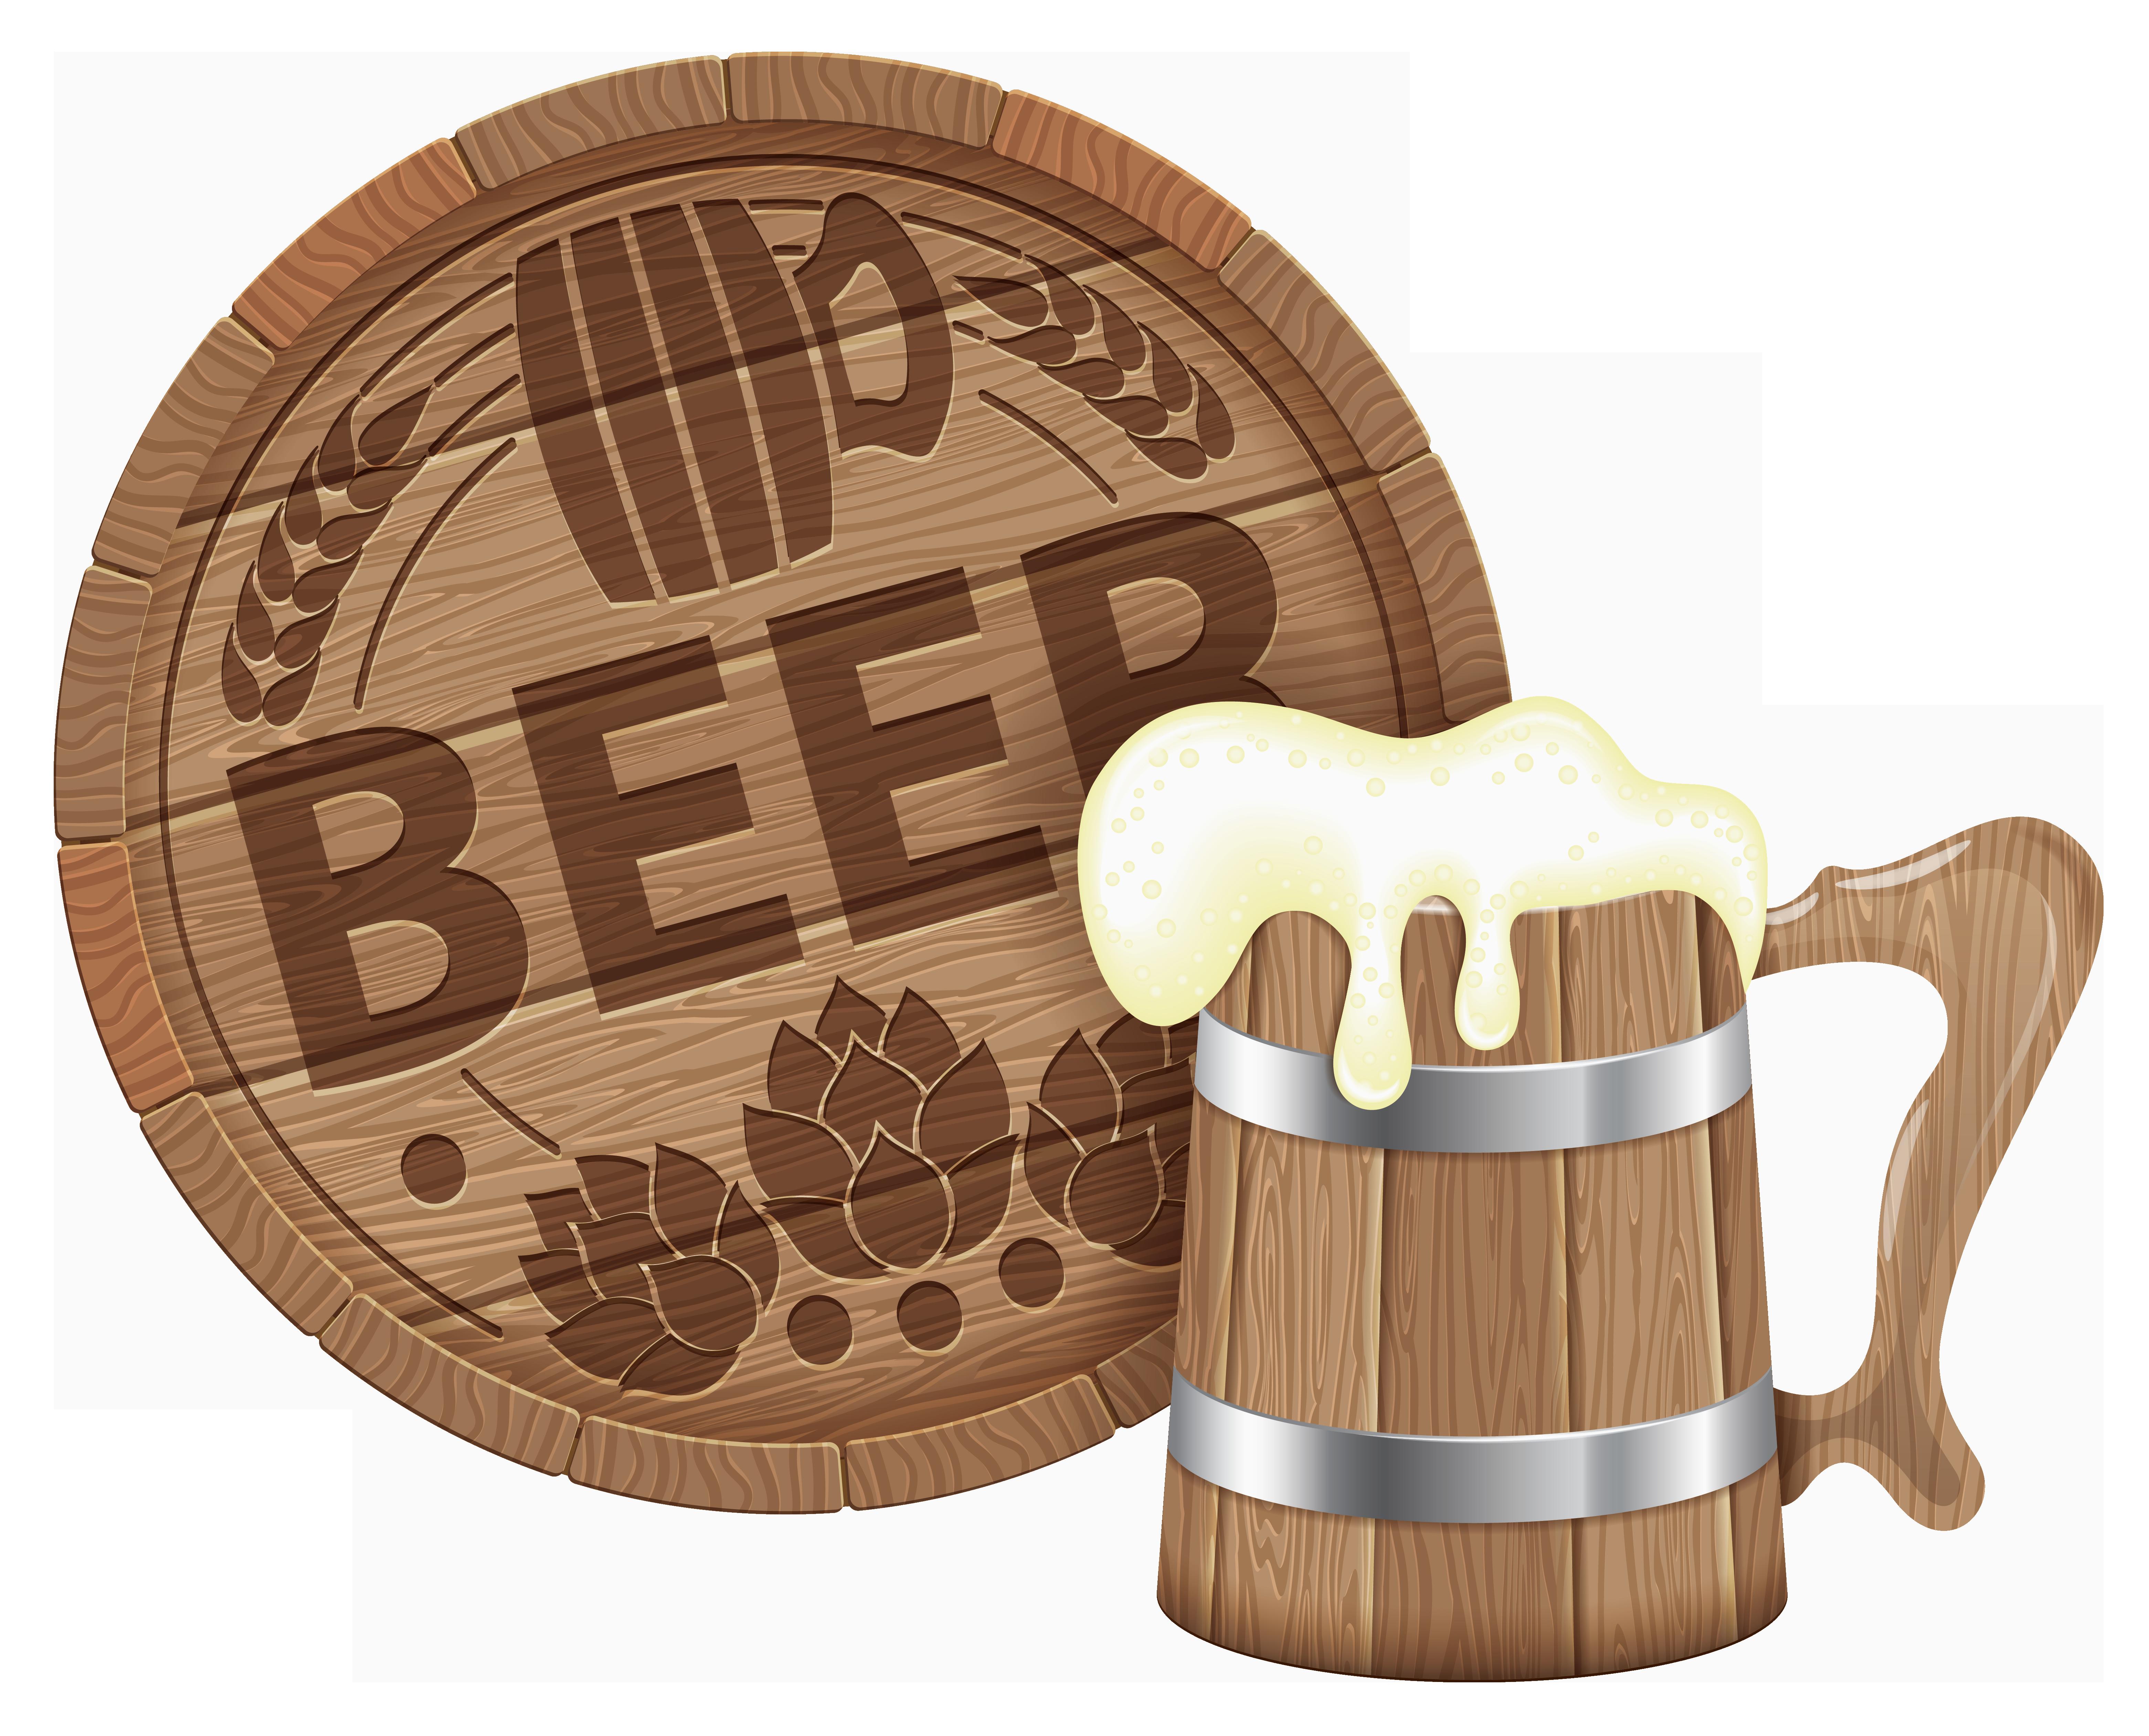 Oktoberfest Beer Barrel And Mug Png Clipart Picture Oktoberfest Beer Beer Beer Barrel